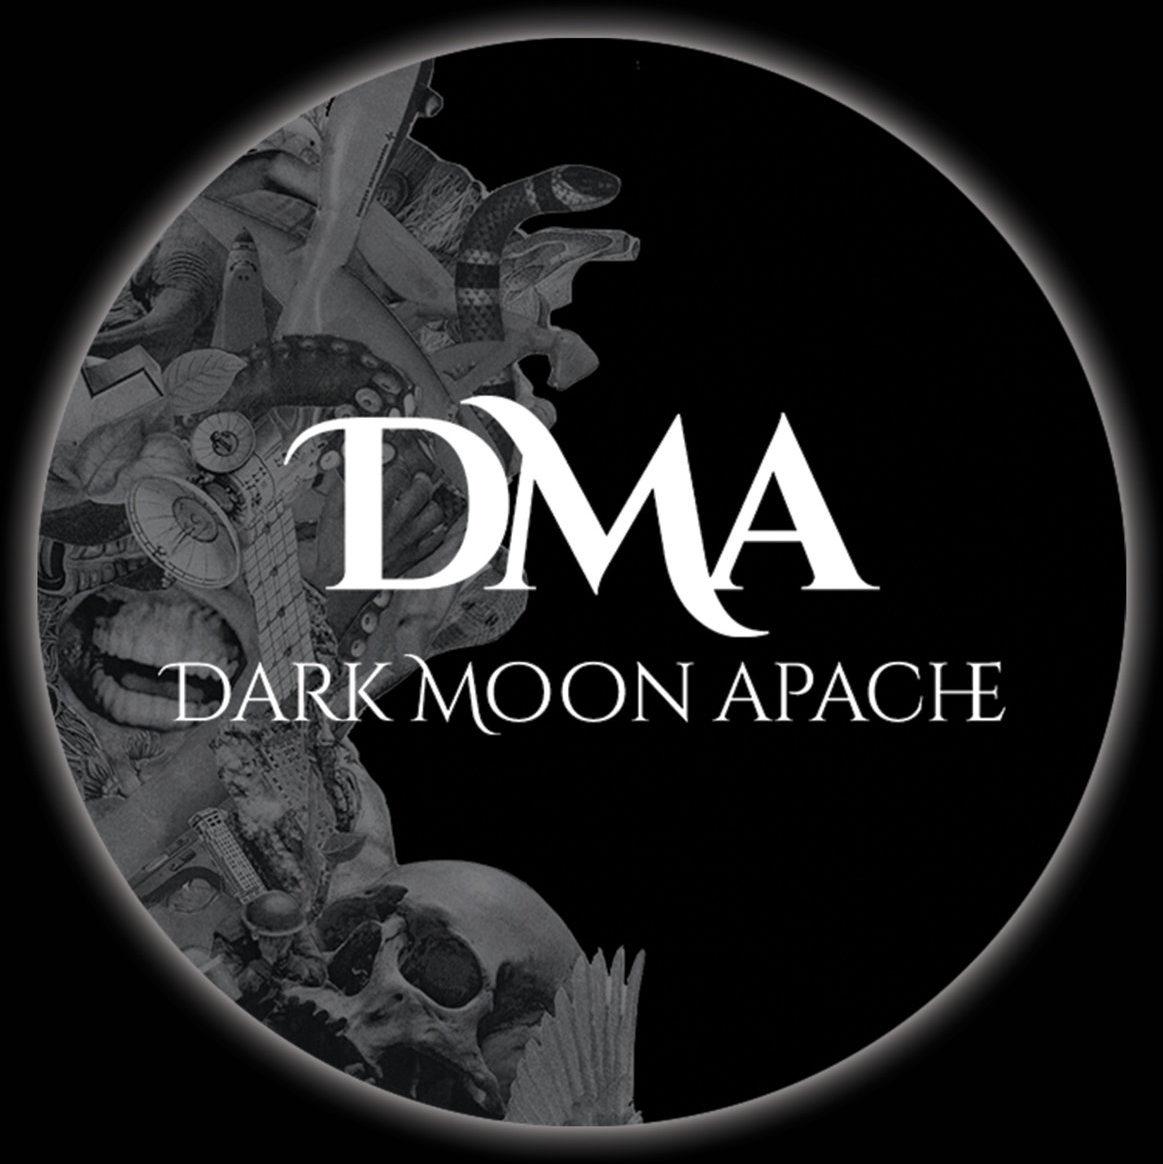 Dark Moon Apache DMA LRG